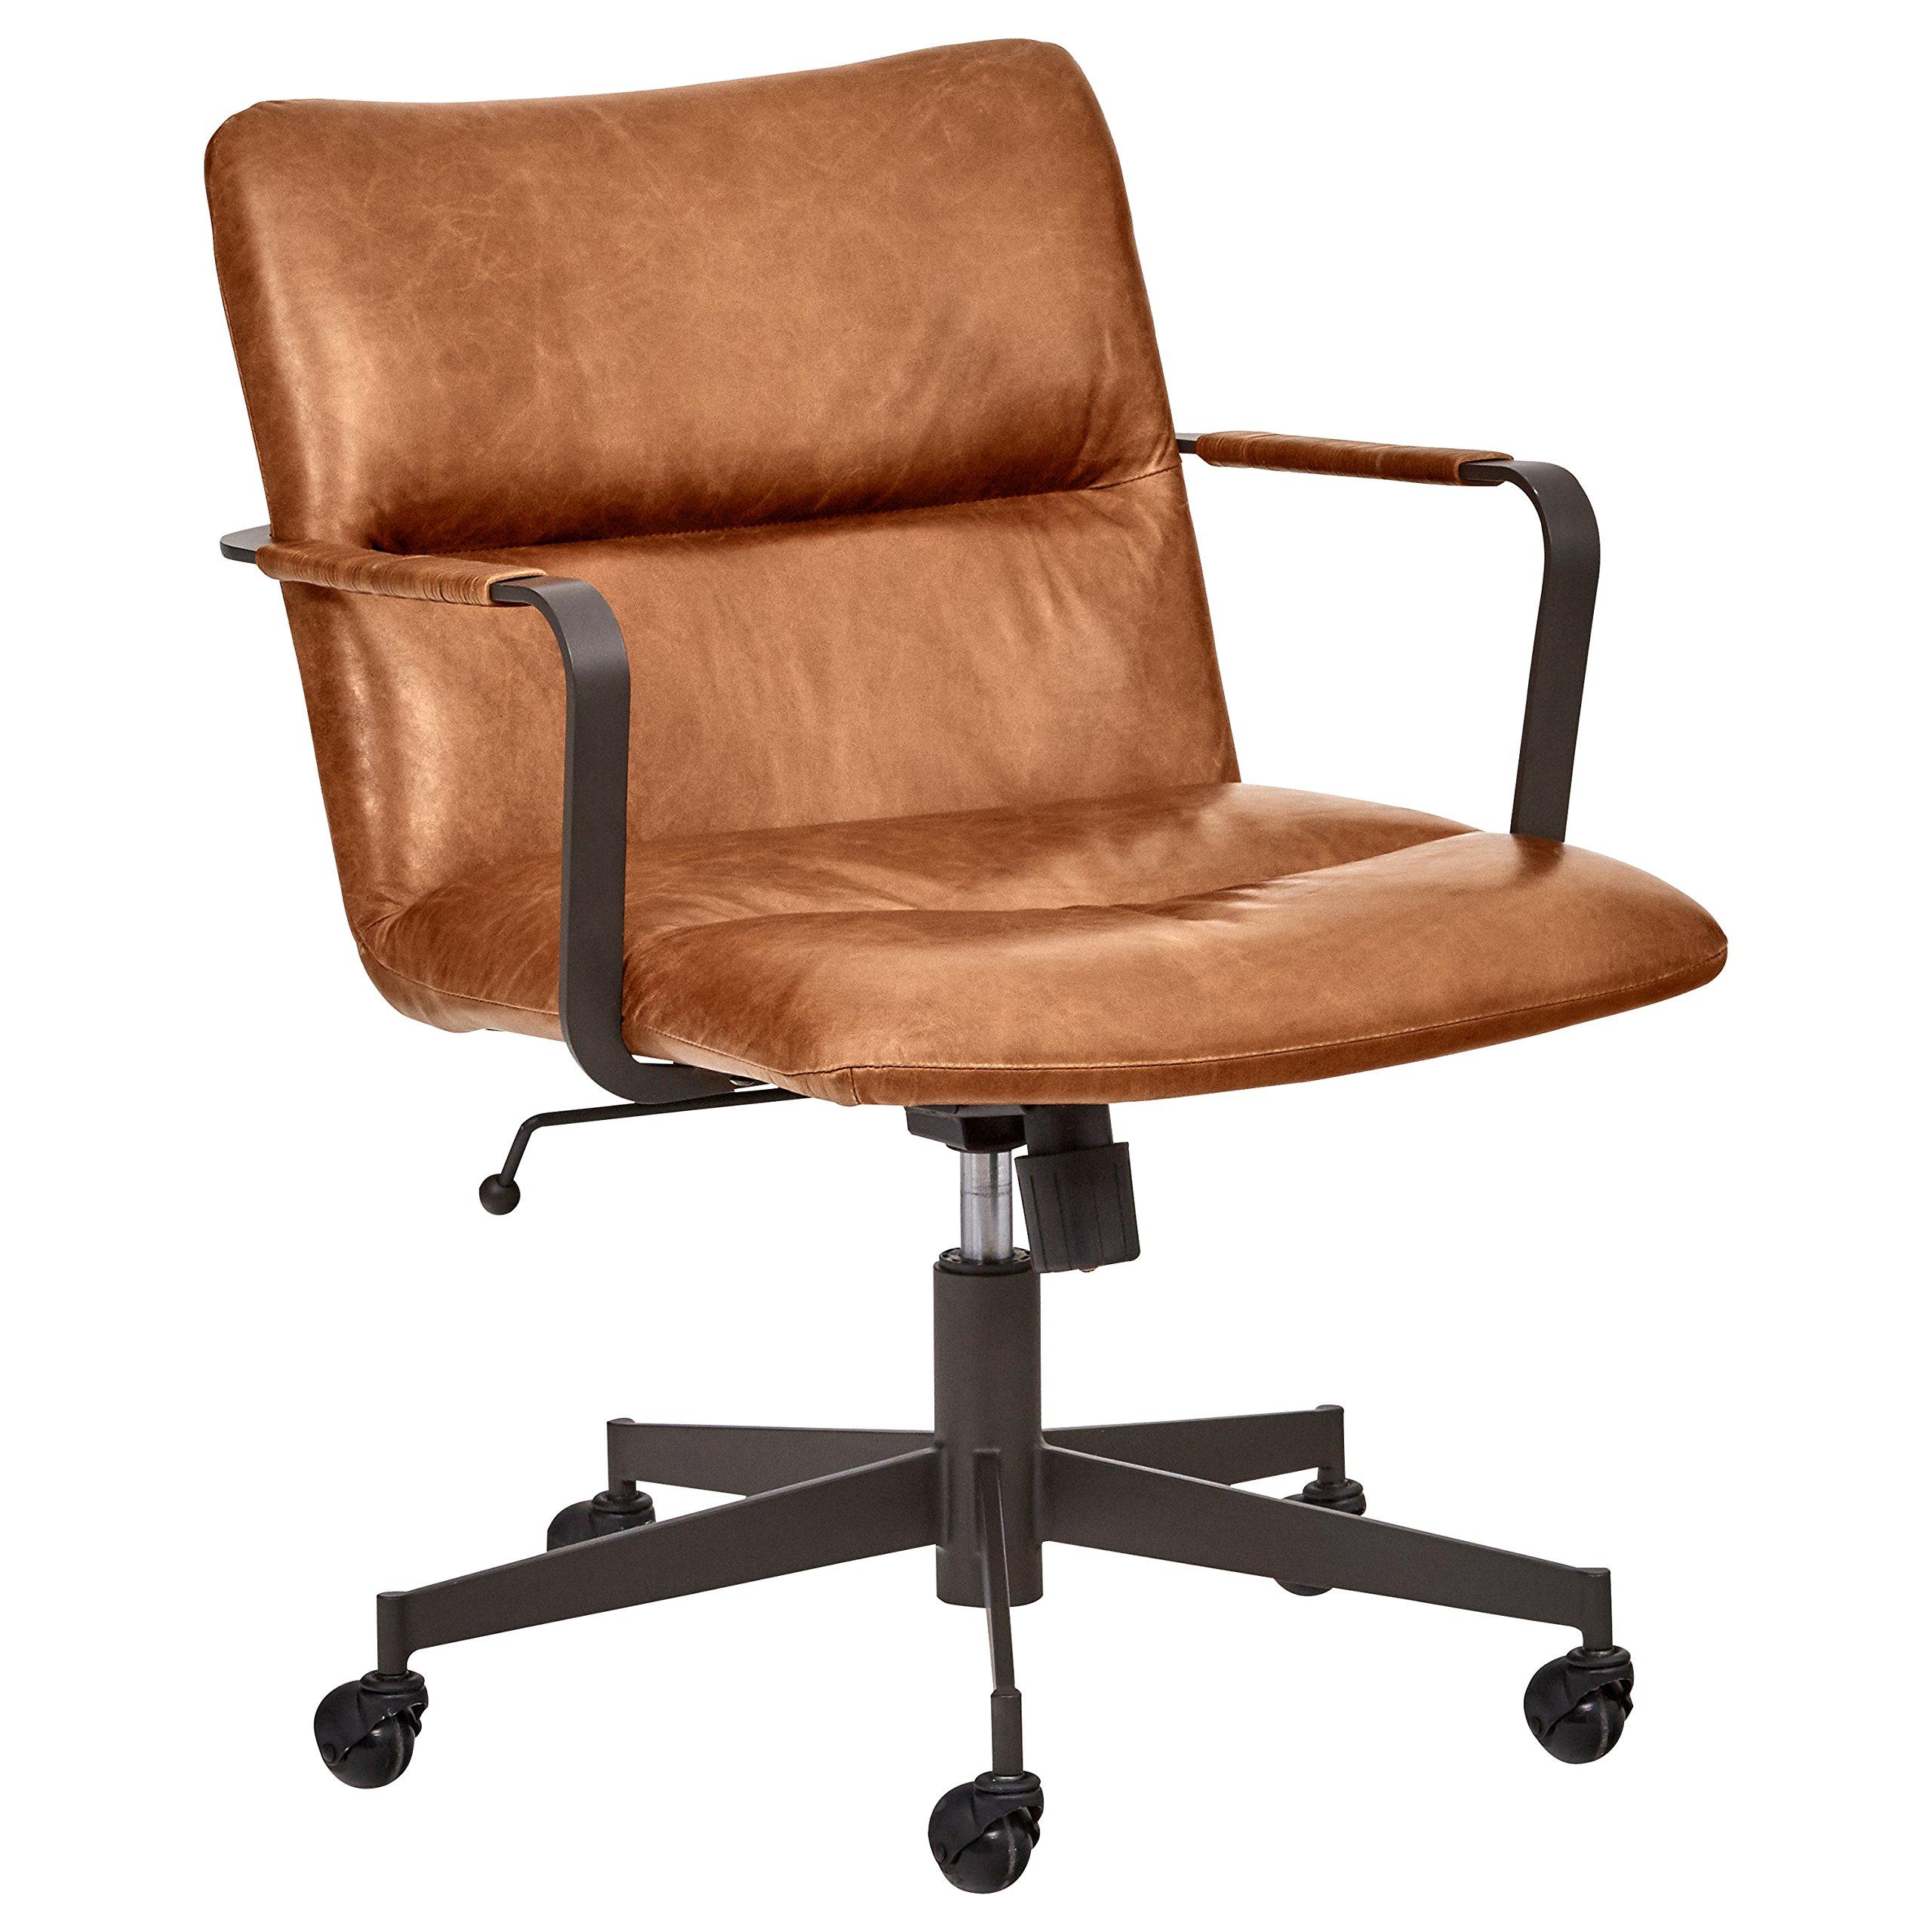 Rivet Mid-Century Leather Three-Panel Chair on Wheels, 25.75'' W, Saddle